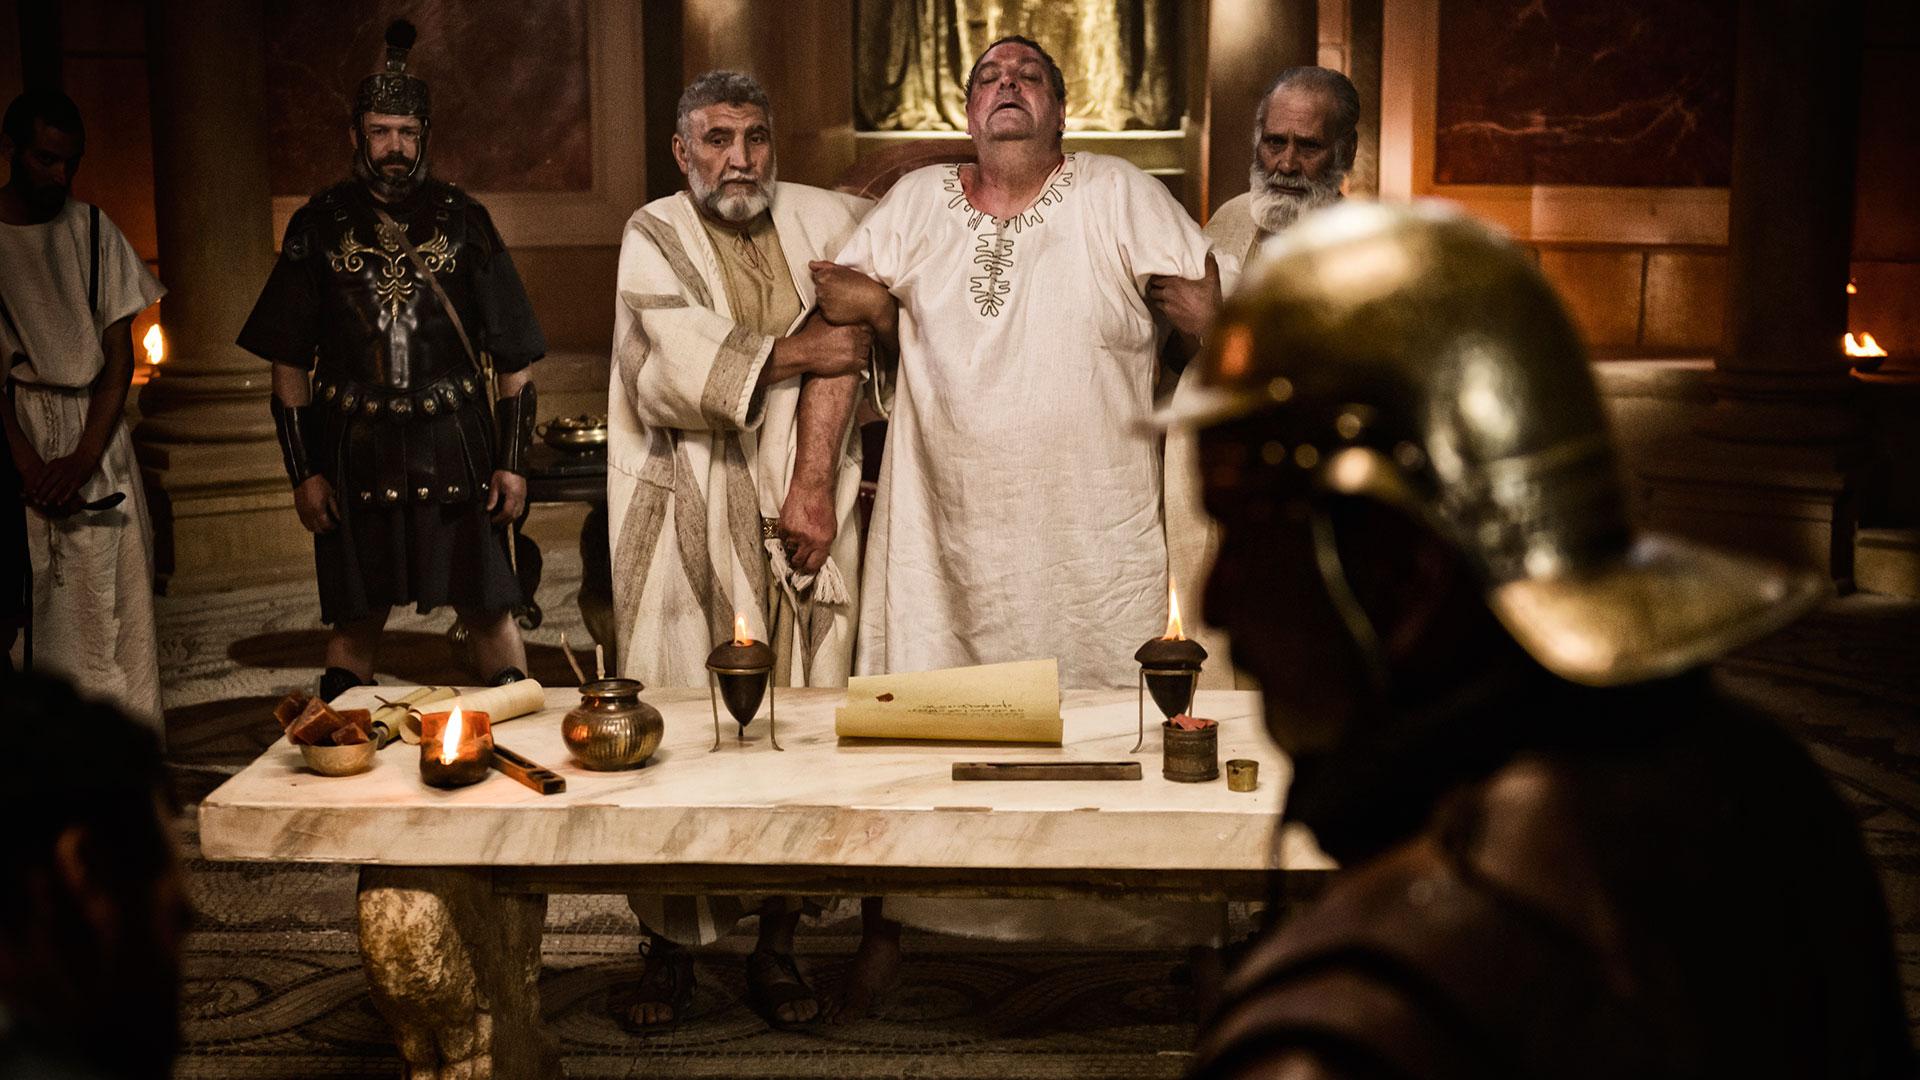 Sam Douglas As King Herod